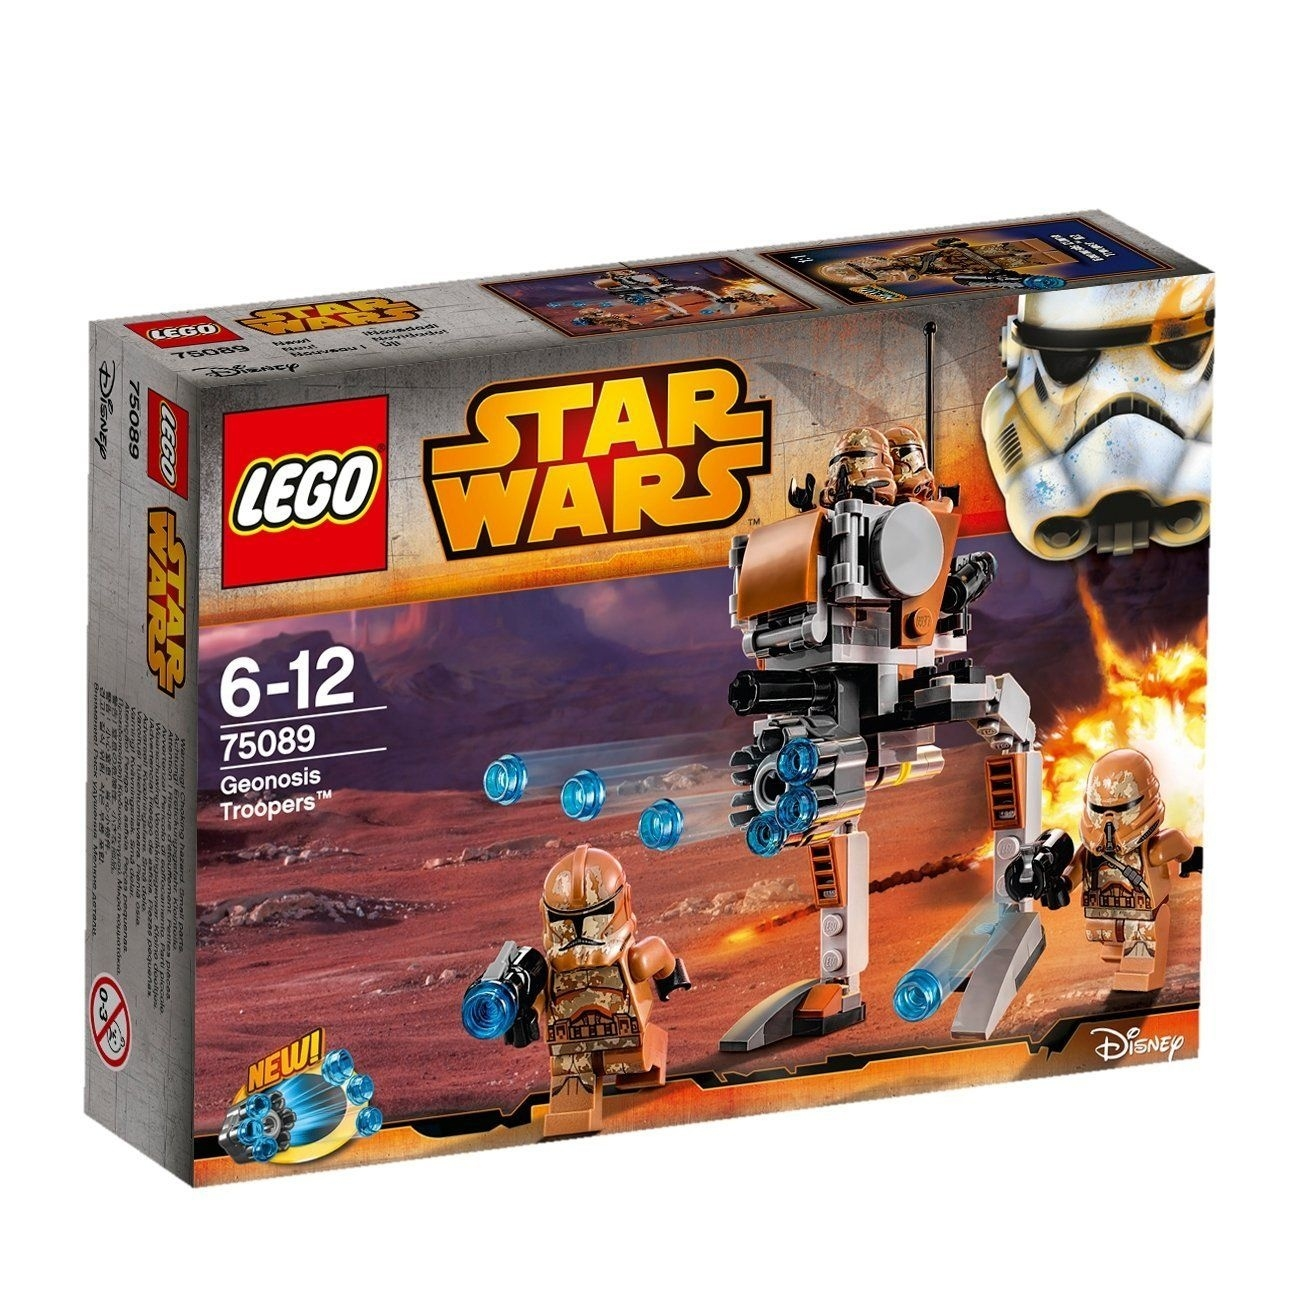 Lego Star Wars: Geonosis Troopers (75089) Manufacturer: Lego Enarxis  Star Wars Lego Sets Code